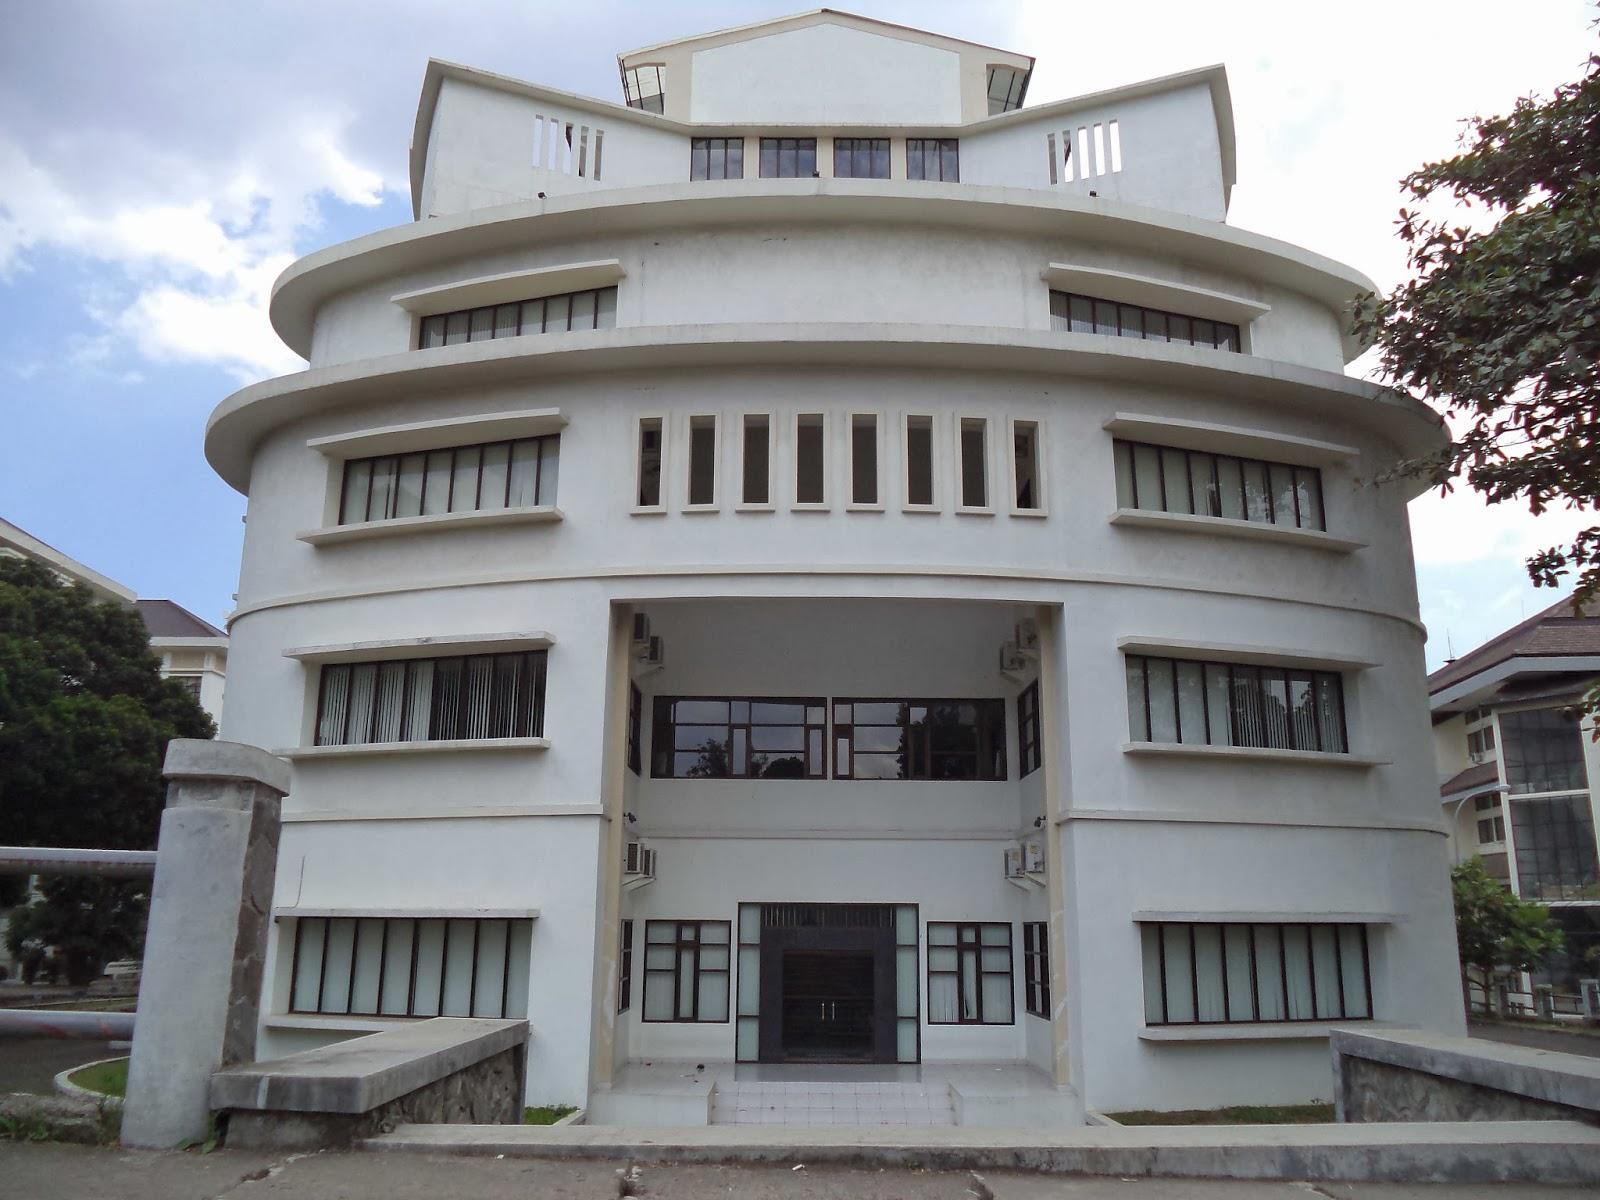 Mengenal gedung UPI - UPI center